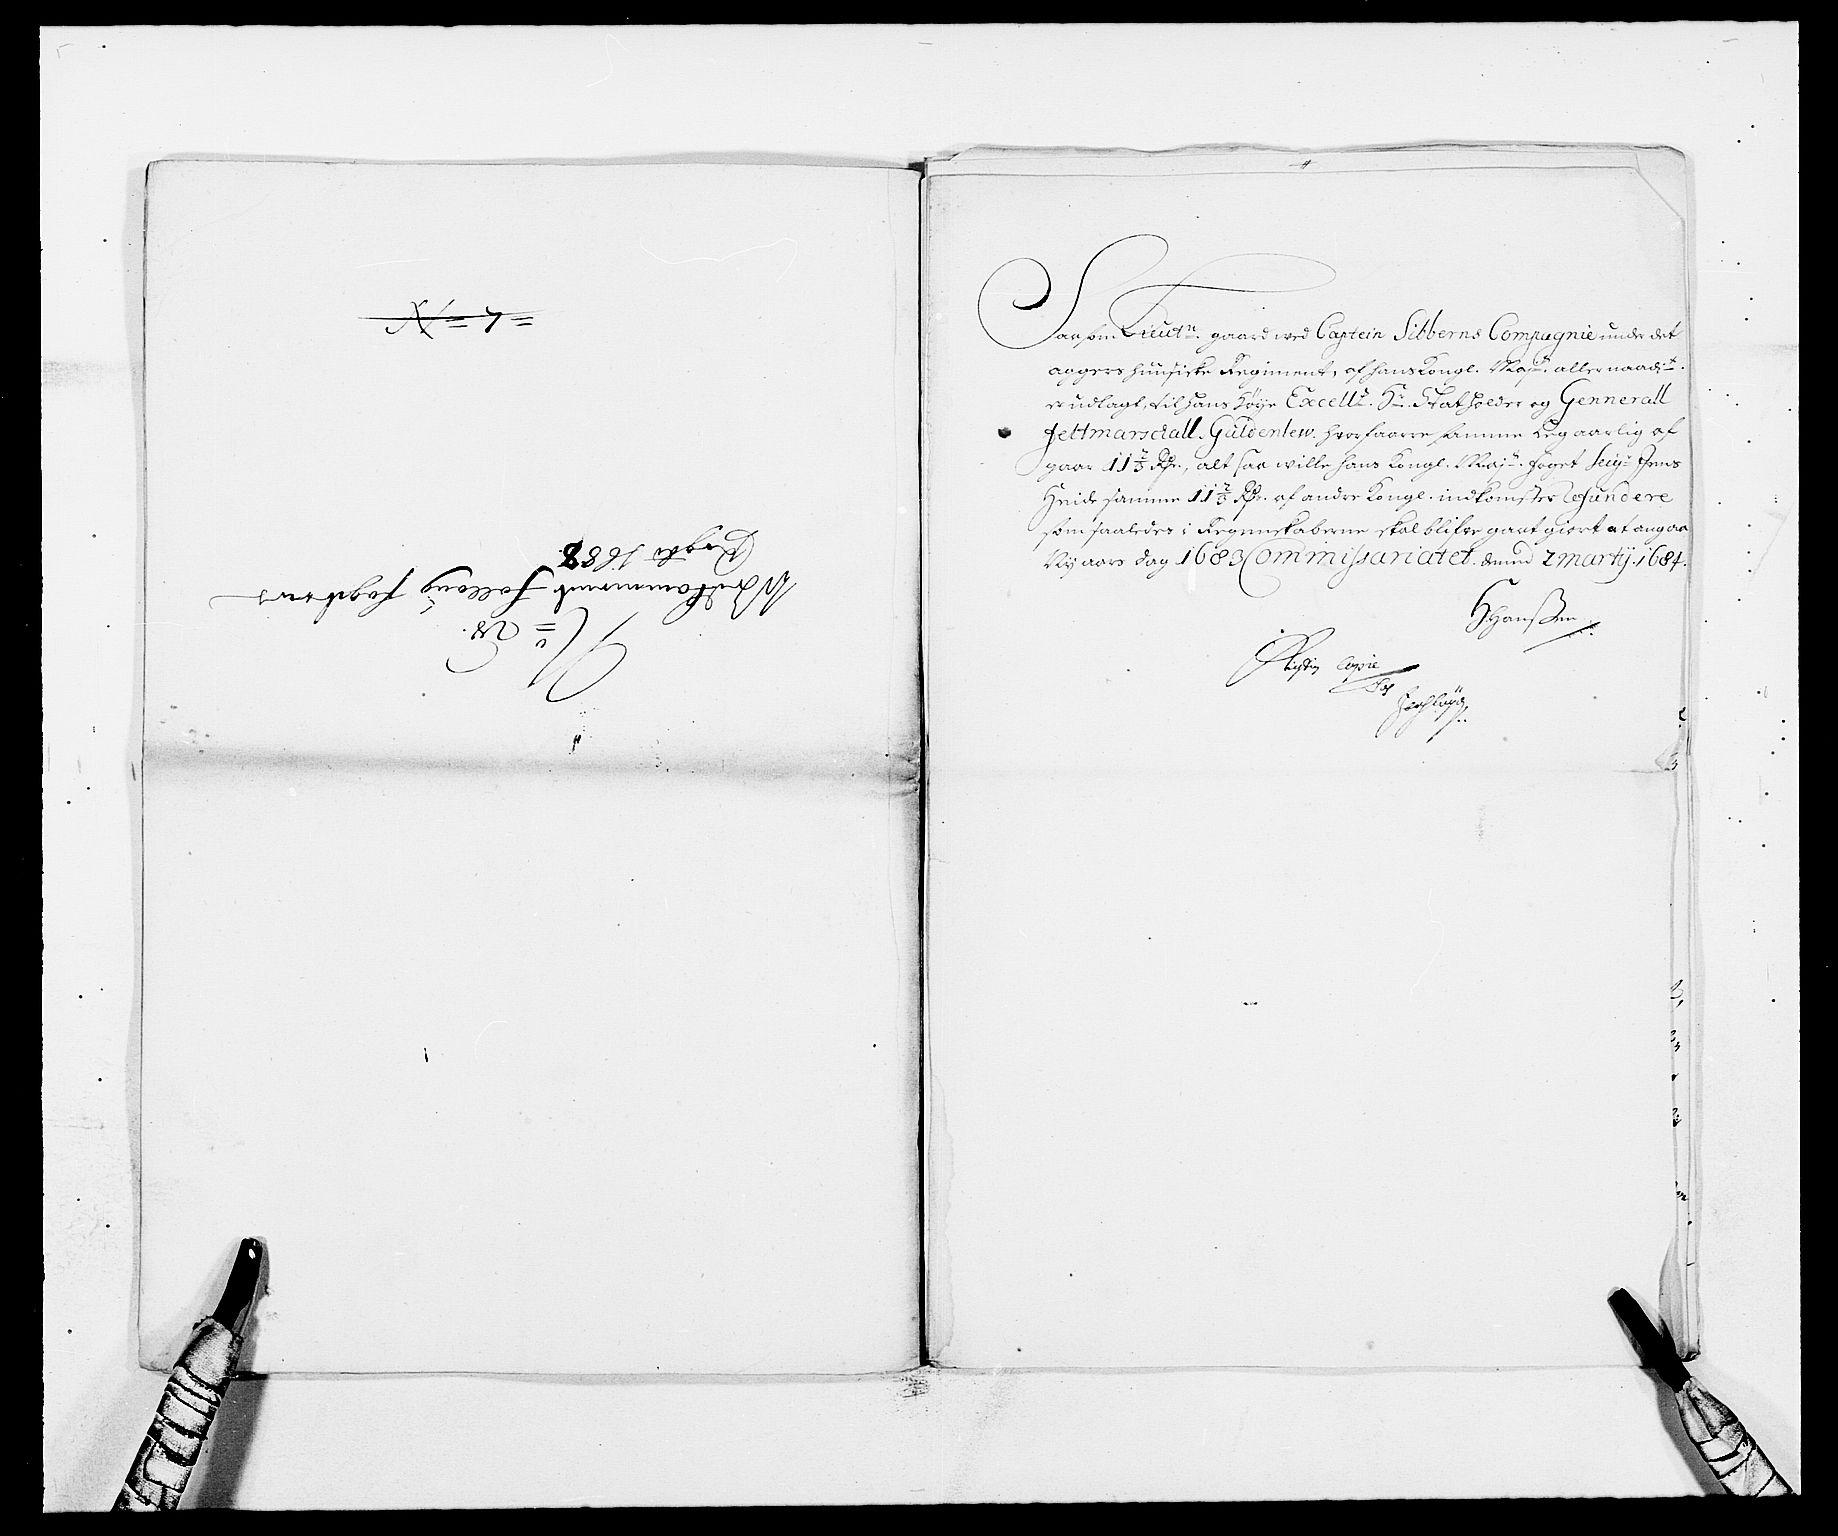 RA, Rentekammeret inntil 1814, Reviderte regnskaper, Fogderegnskap, R09/L0436: Fogderegnskap Follo, 1685-1691, s. 163